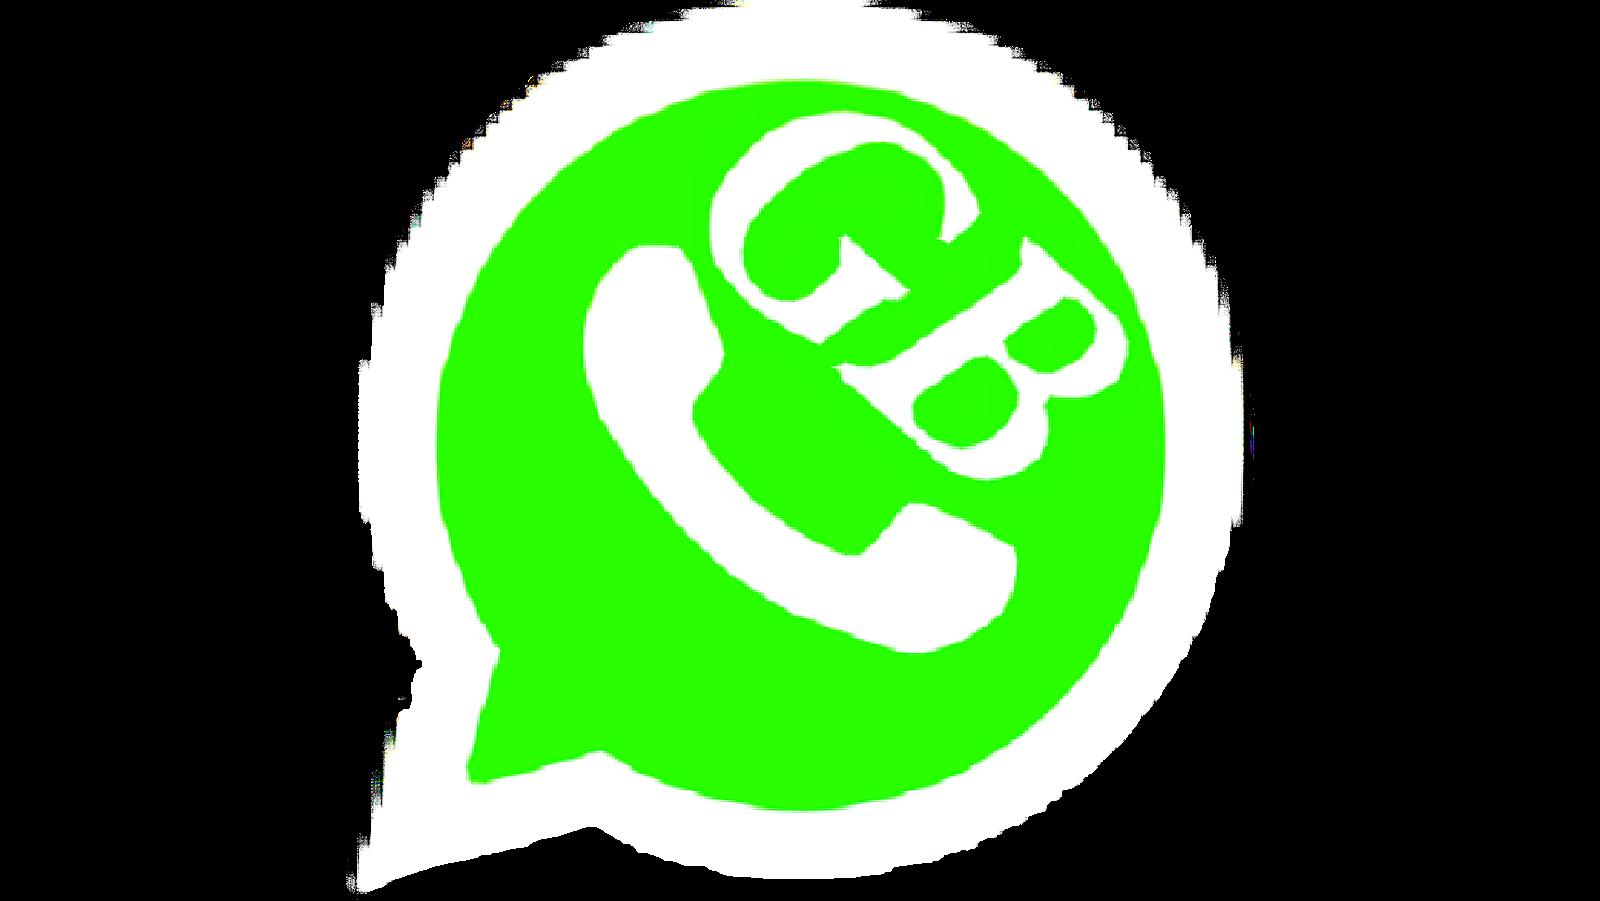 gb WhatsApp latest version direct download apk link